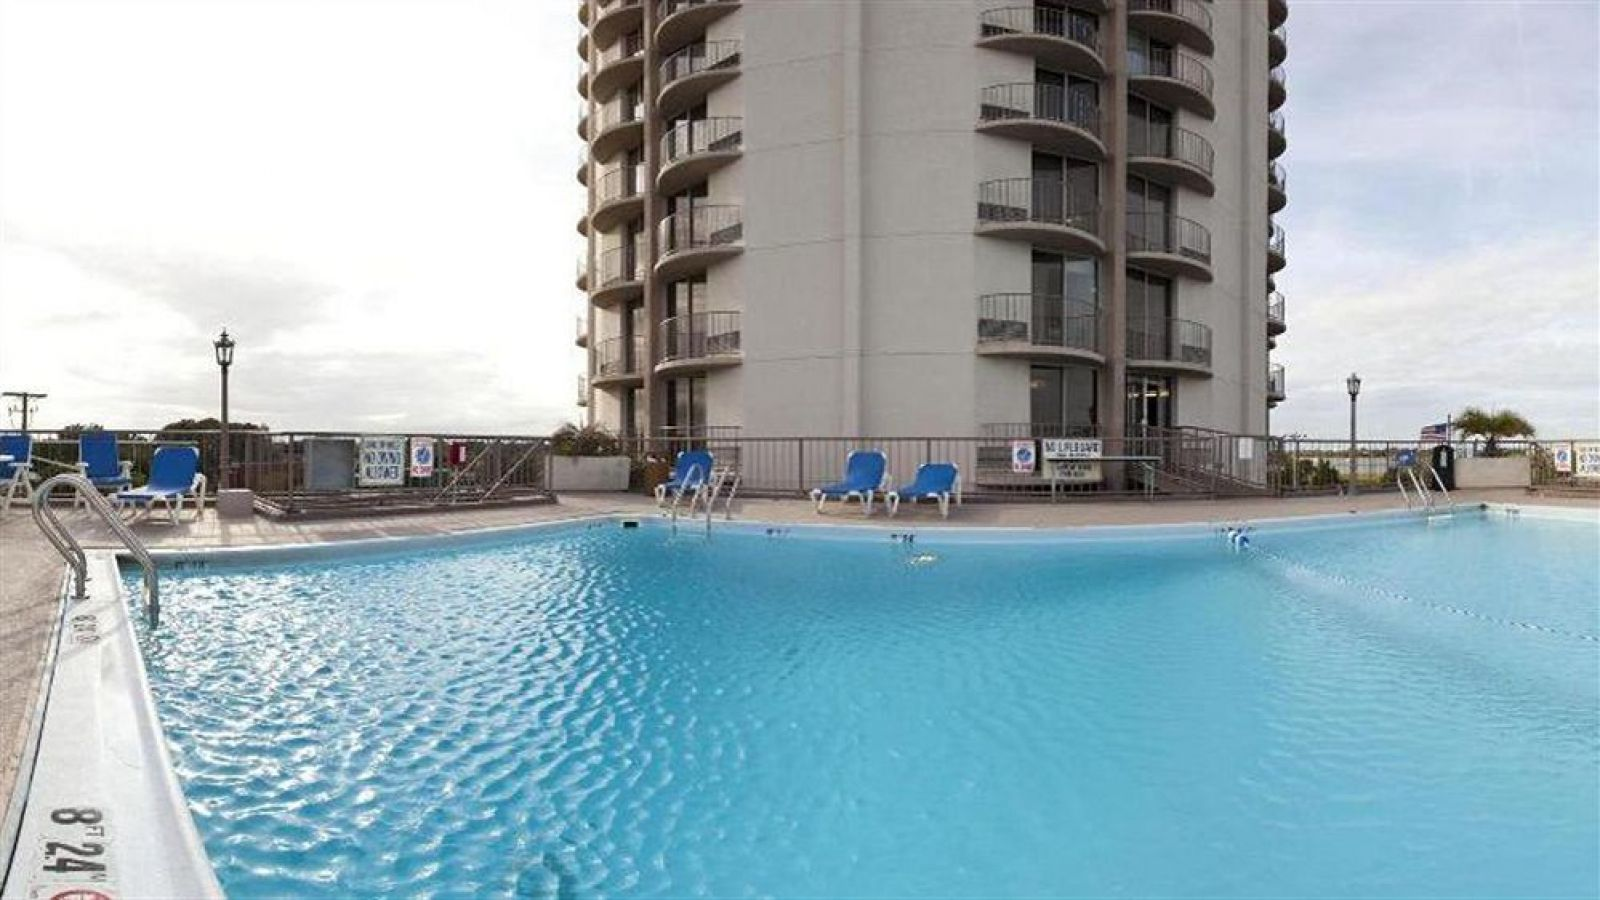 Holiday Inn Charleston Riverview - pool area